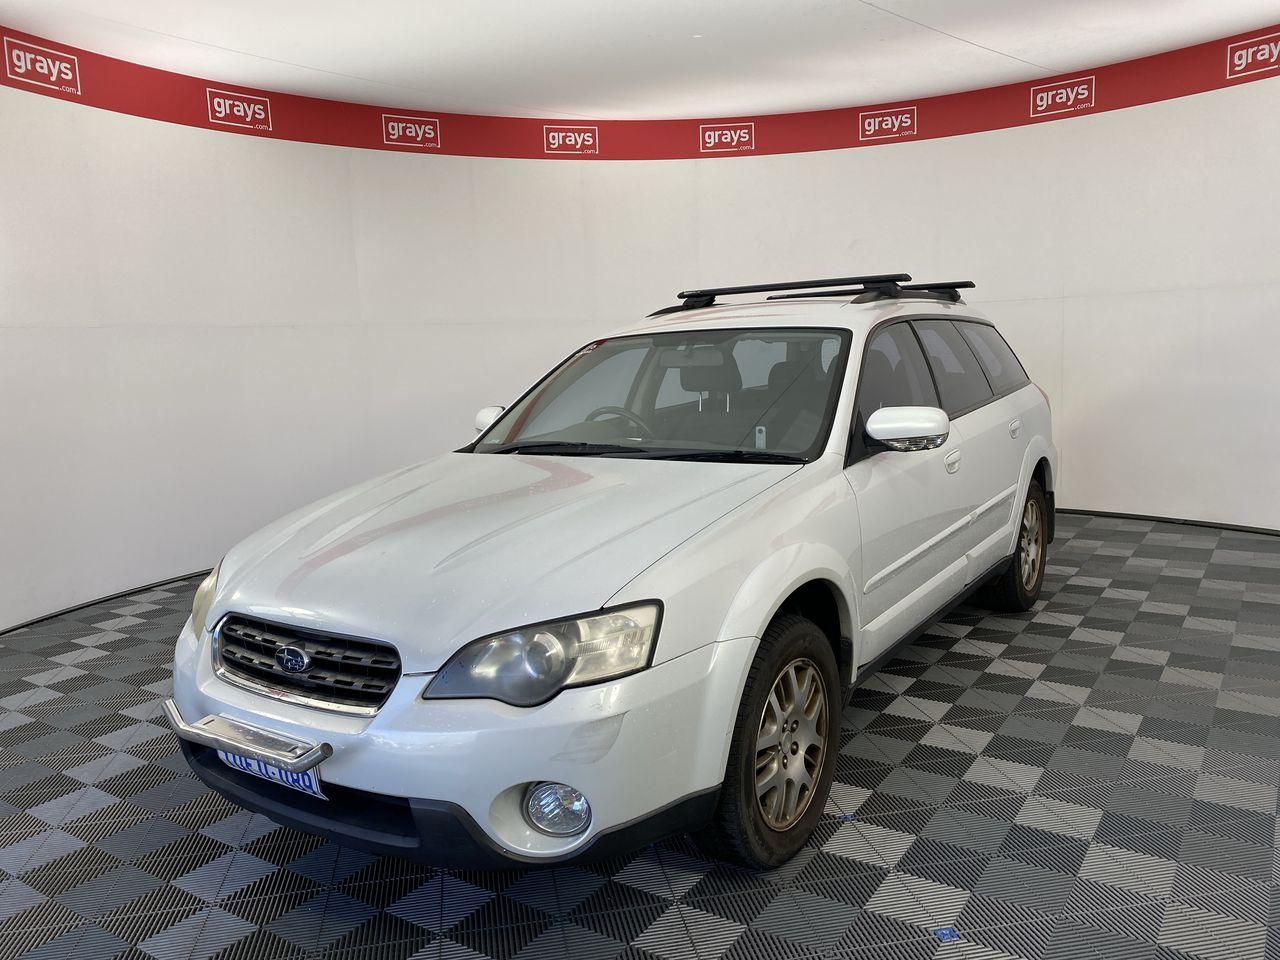 2006 Subaru Outback 2.5i B4A Automatic Wagon